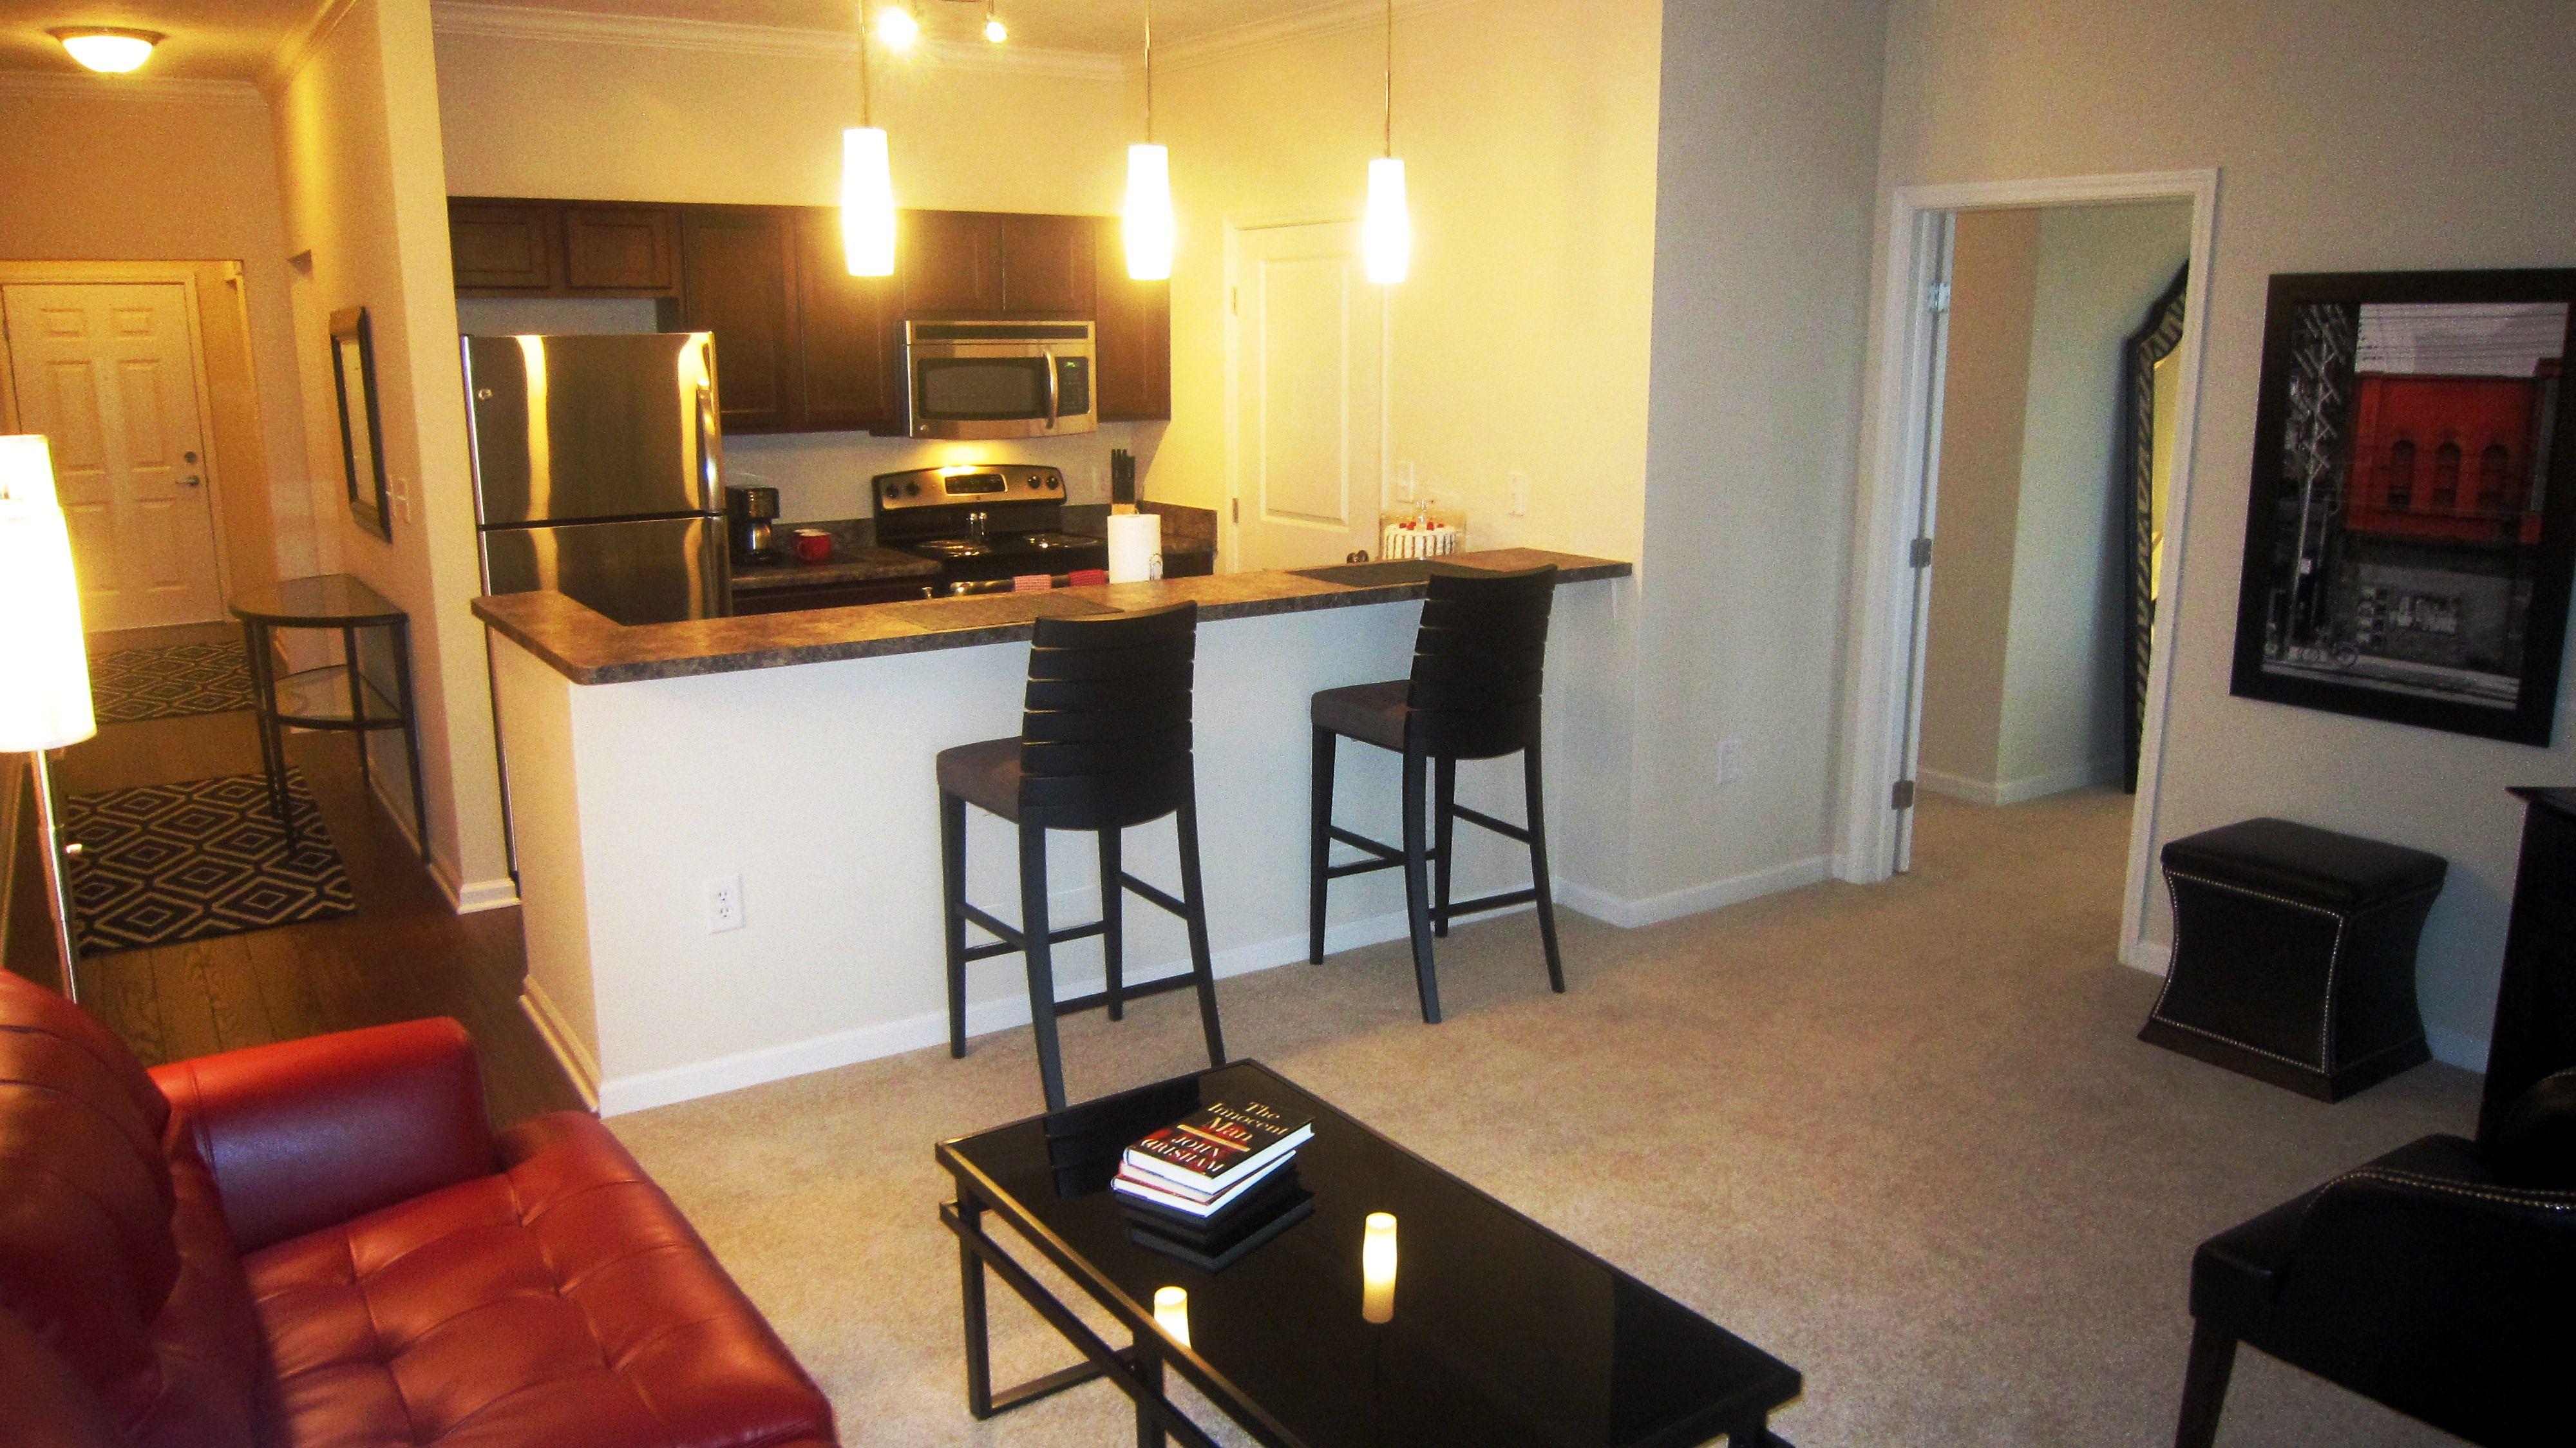 <h6>Apartment home</h6>